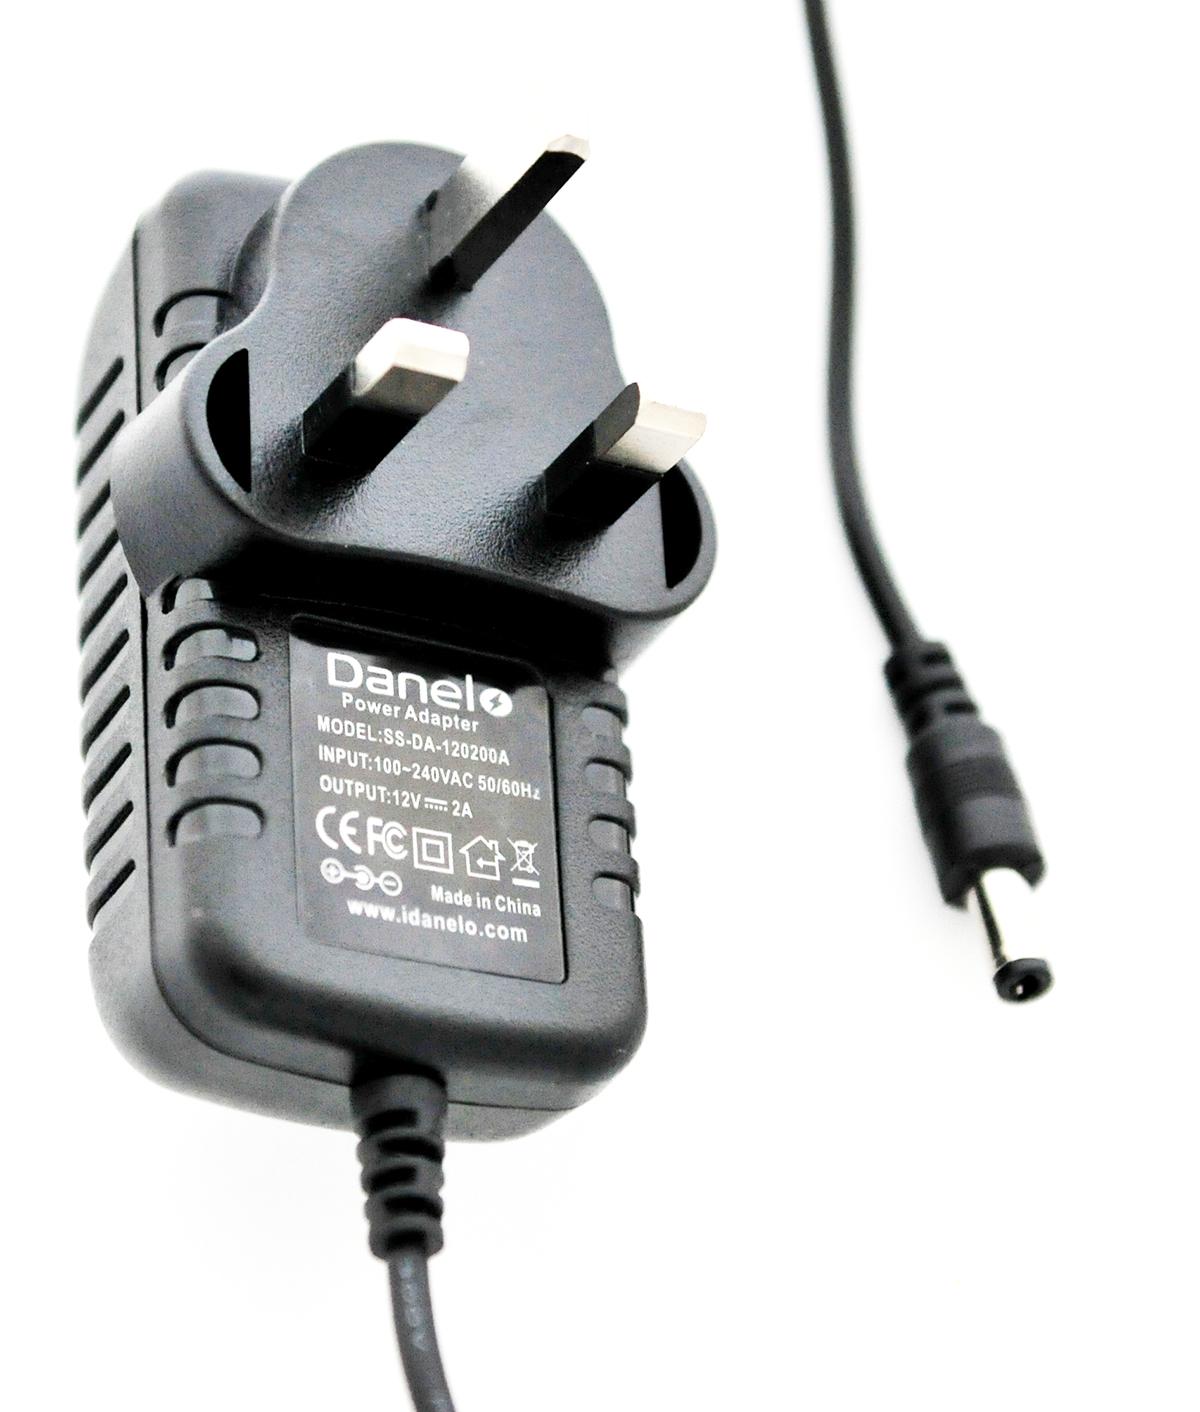 danelo 12v 2a secteur chargeur adaptateur alimentation pour bose soundlink mini ebay. Black Bedroom Furniture Sets. Home Design Ideas